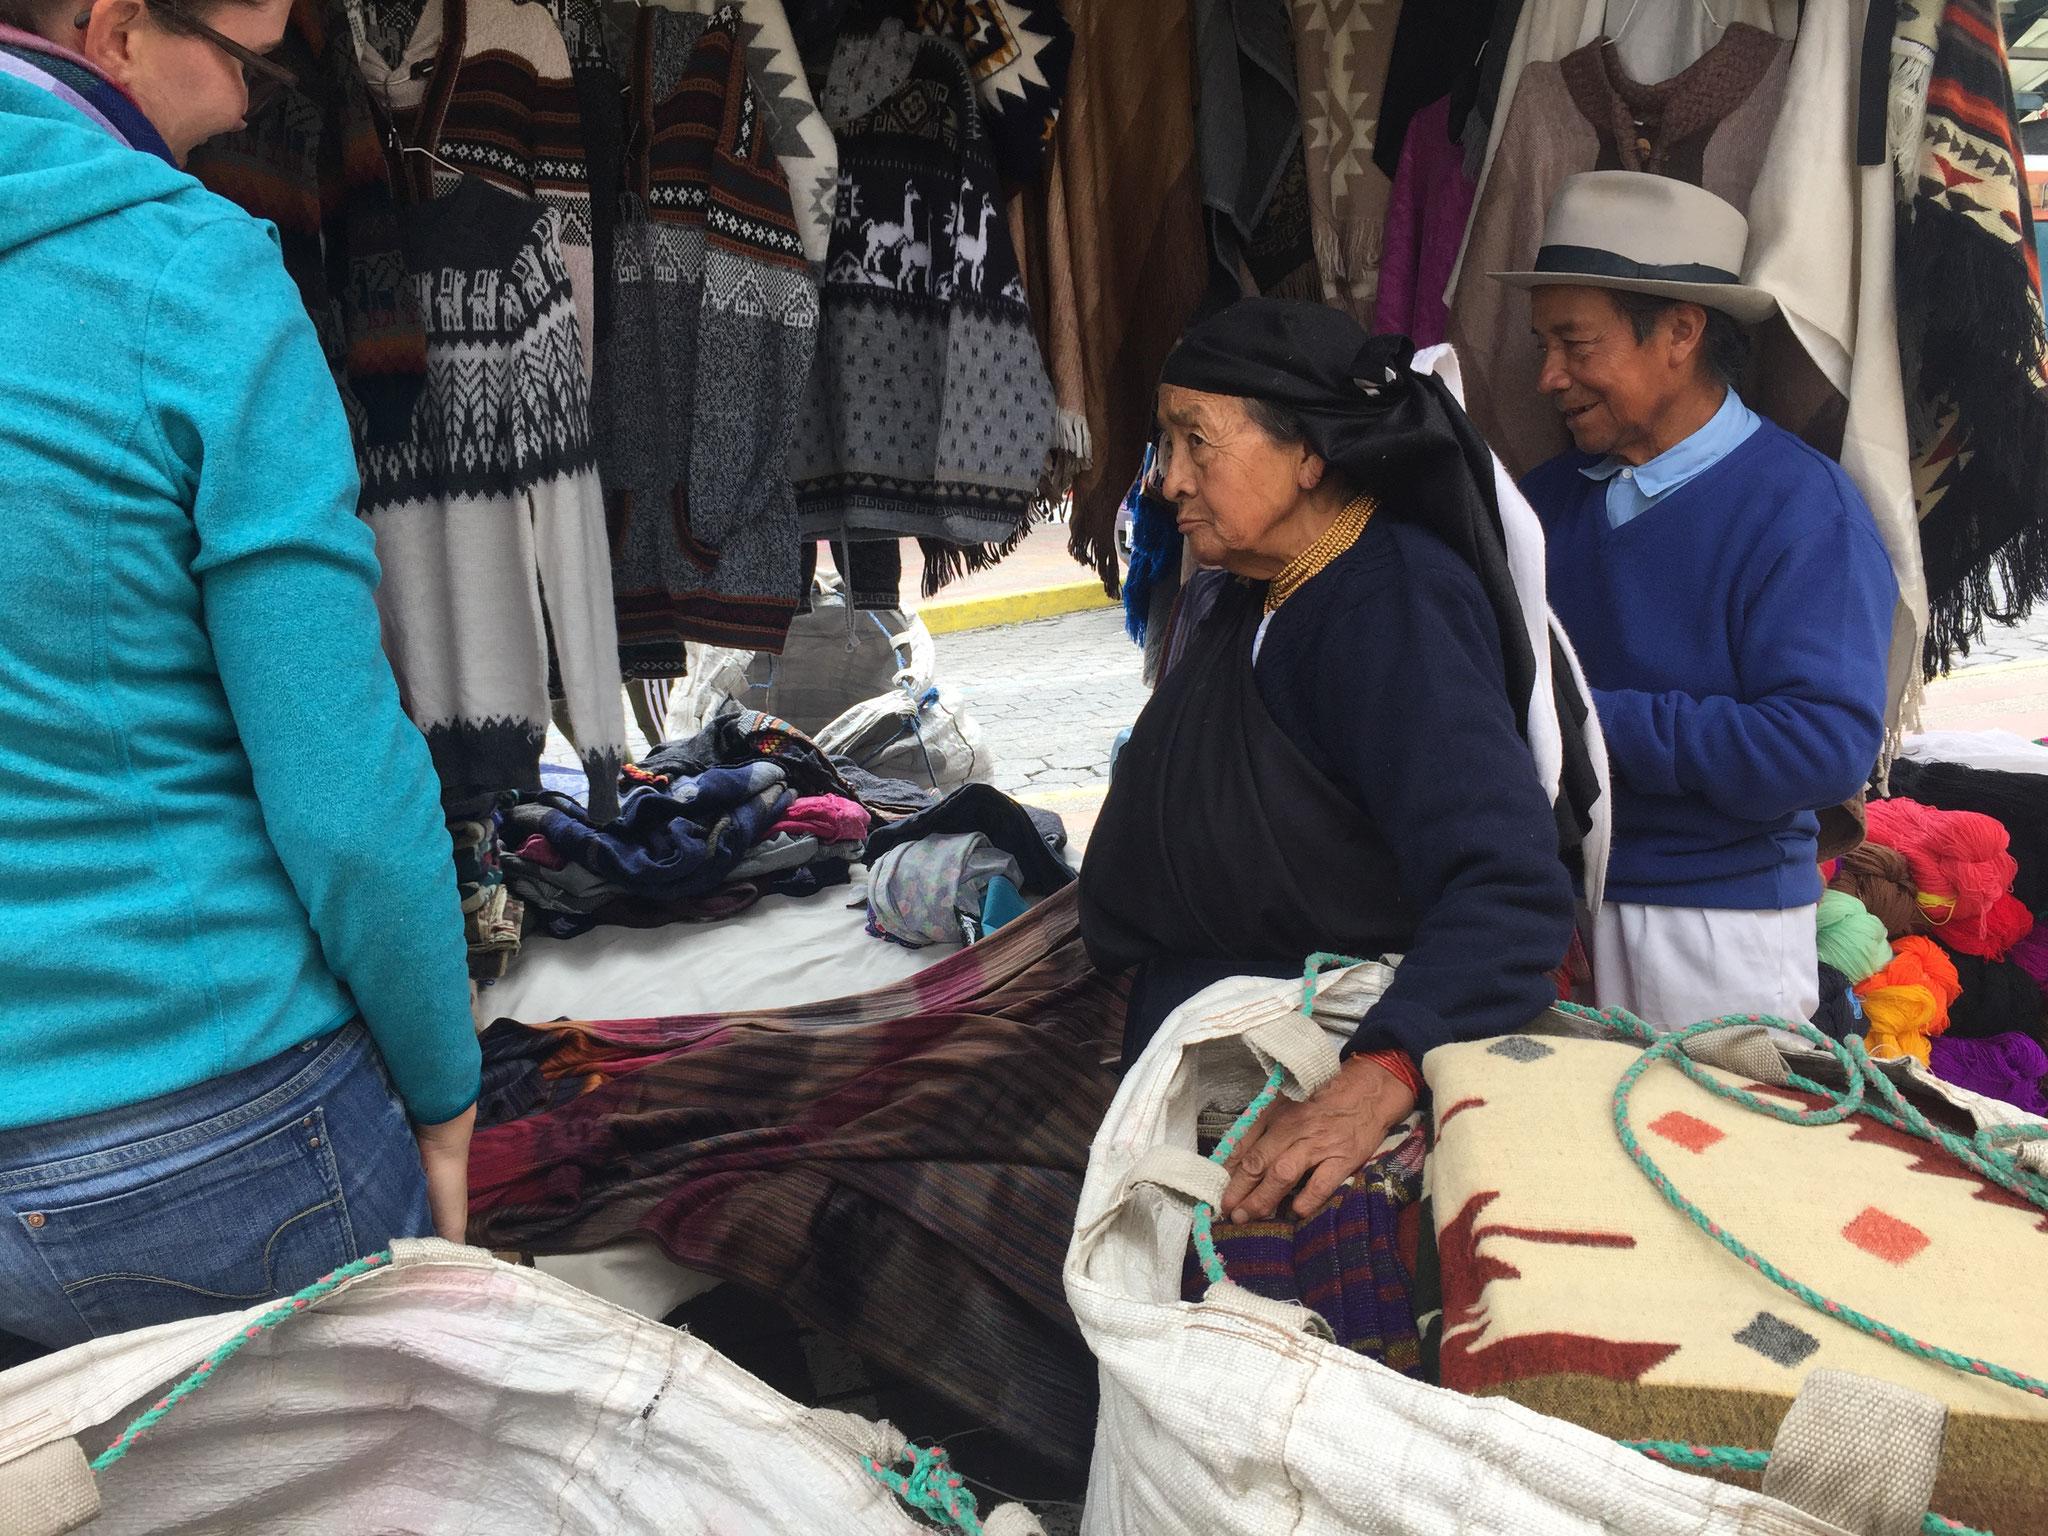 Markt in Otawalo